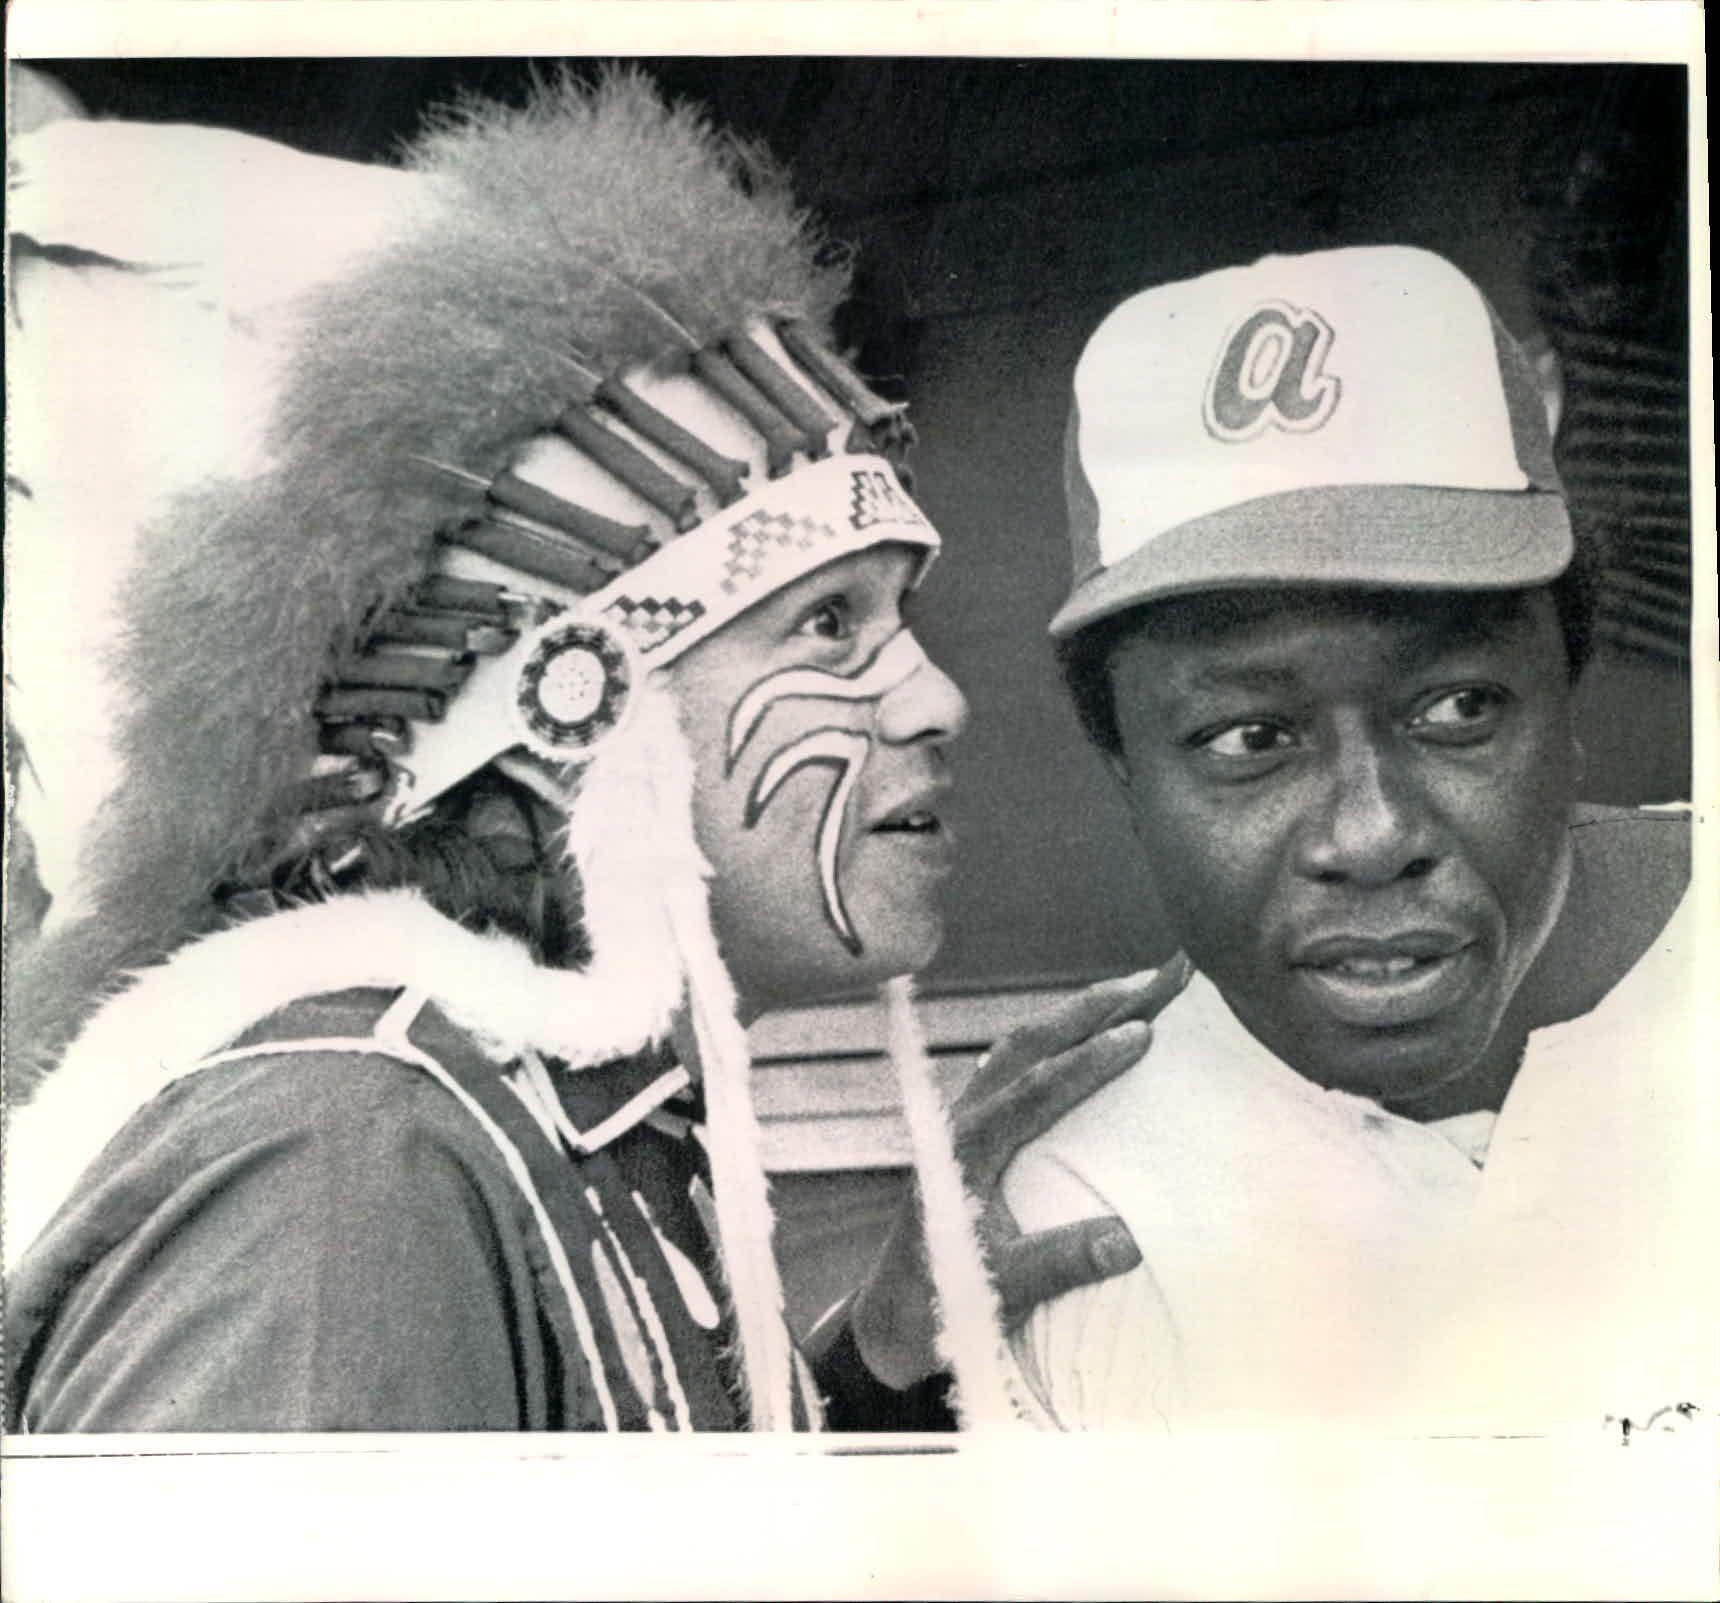 Chief Noc A Homa And Hank Aaron Atlanta Braves Atlanta Braves Wallpaper Atlanta Braves Baseball